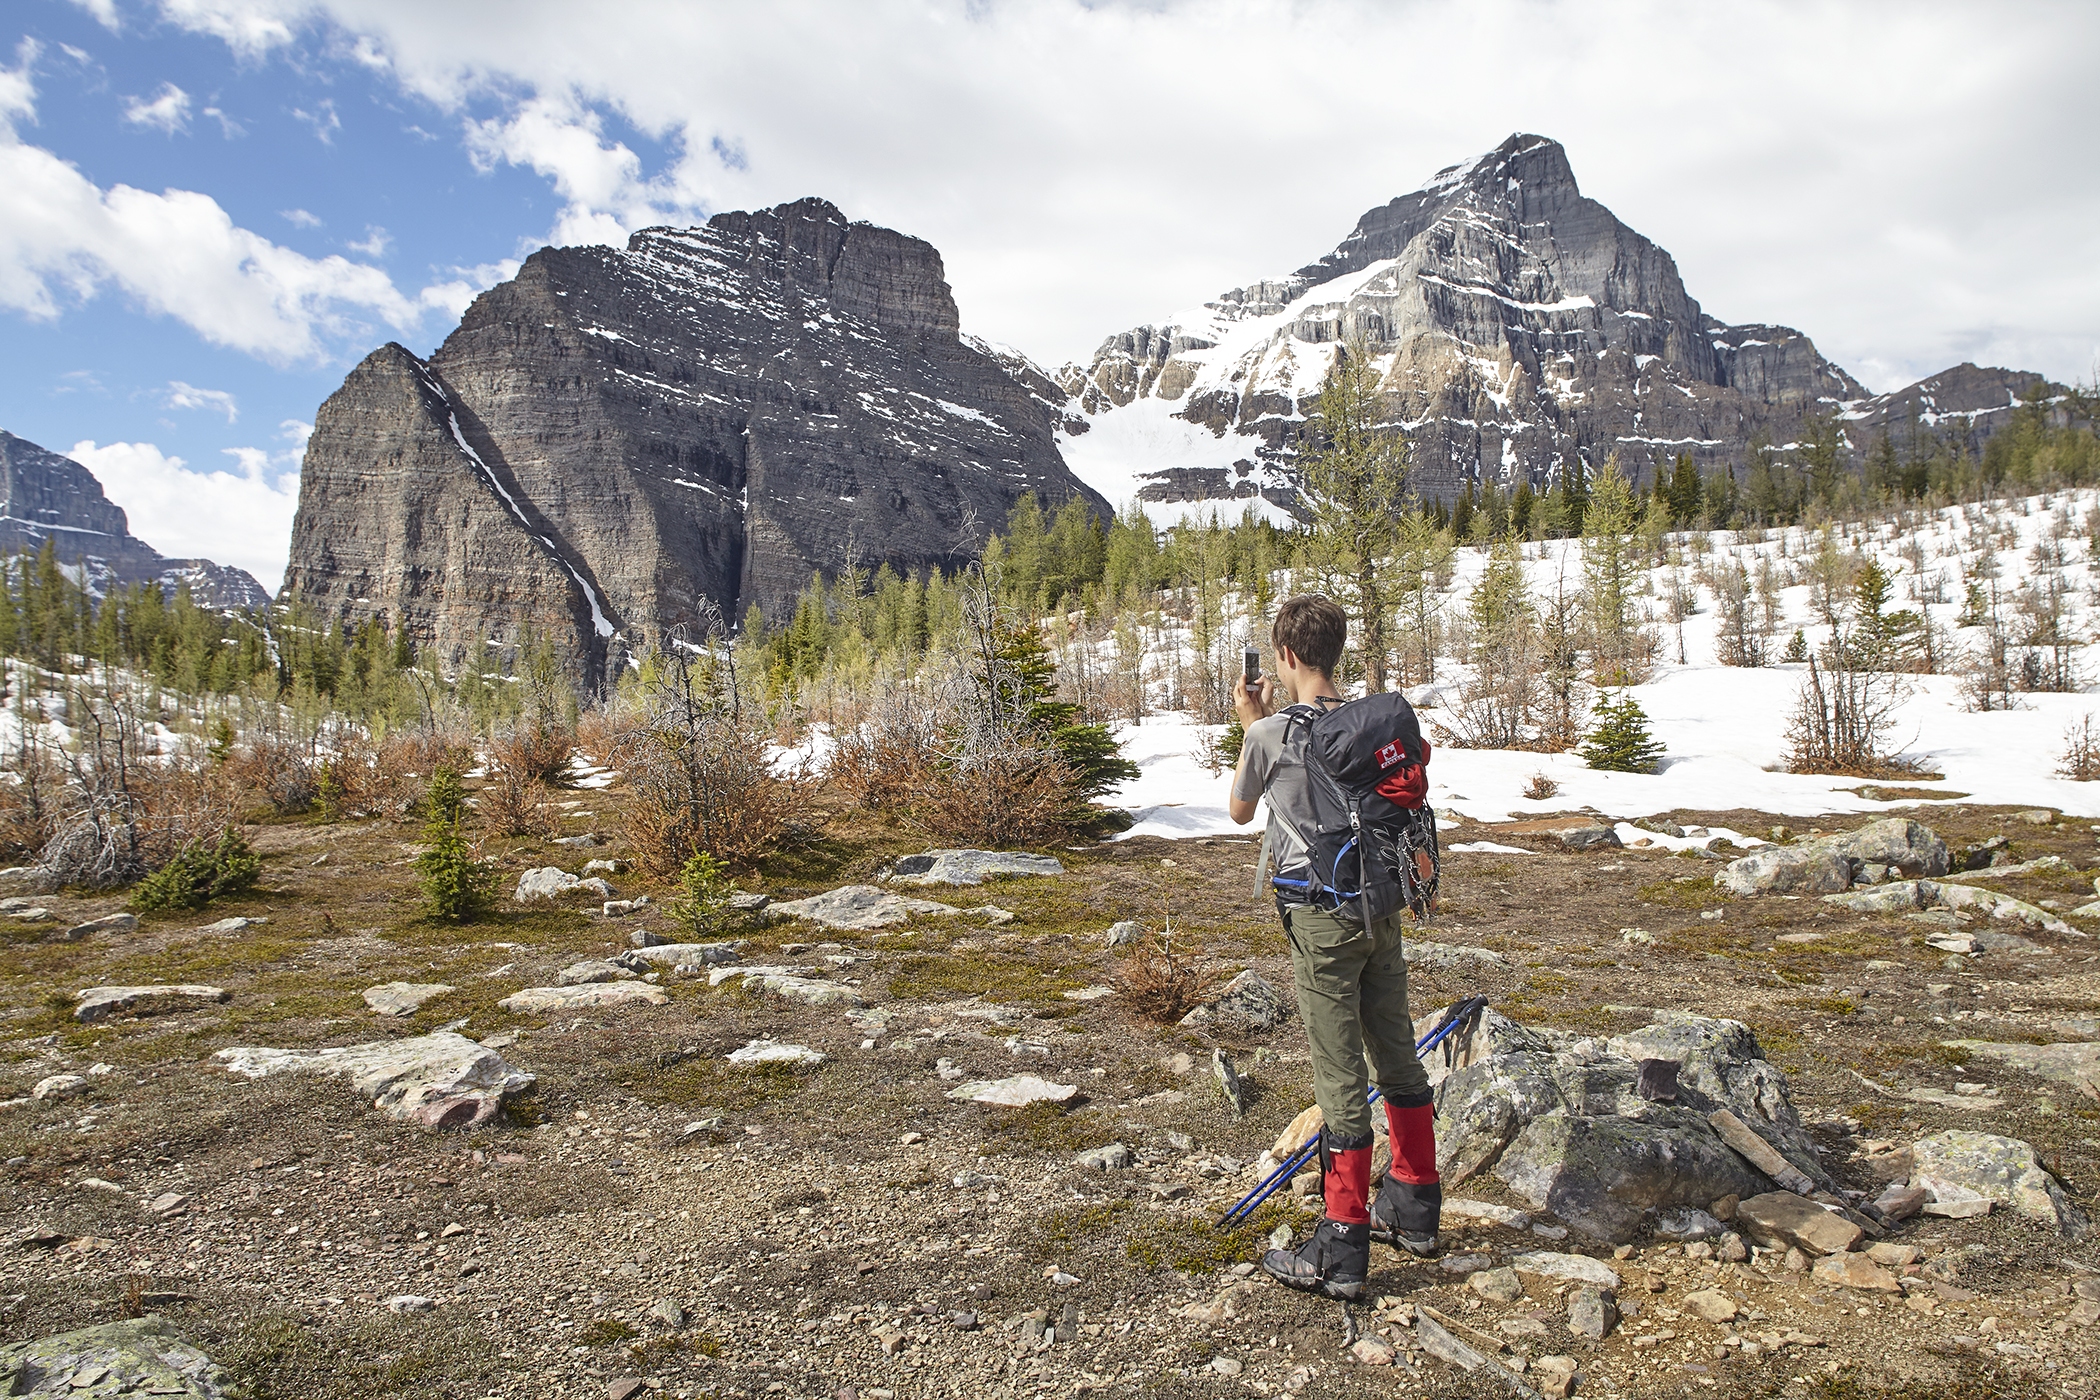 Yuri at Saddleback Pass with Sheol Mountain and Haddo Peak looming behind.